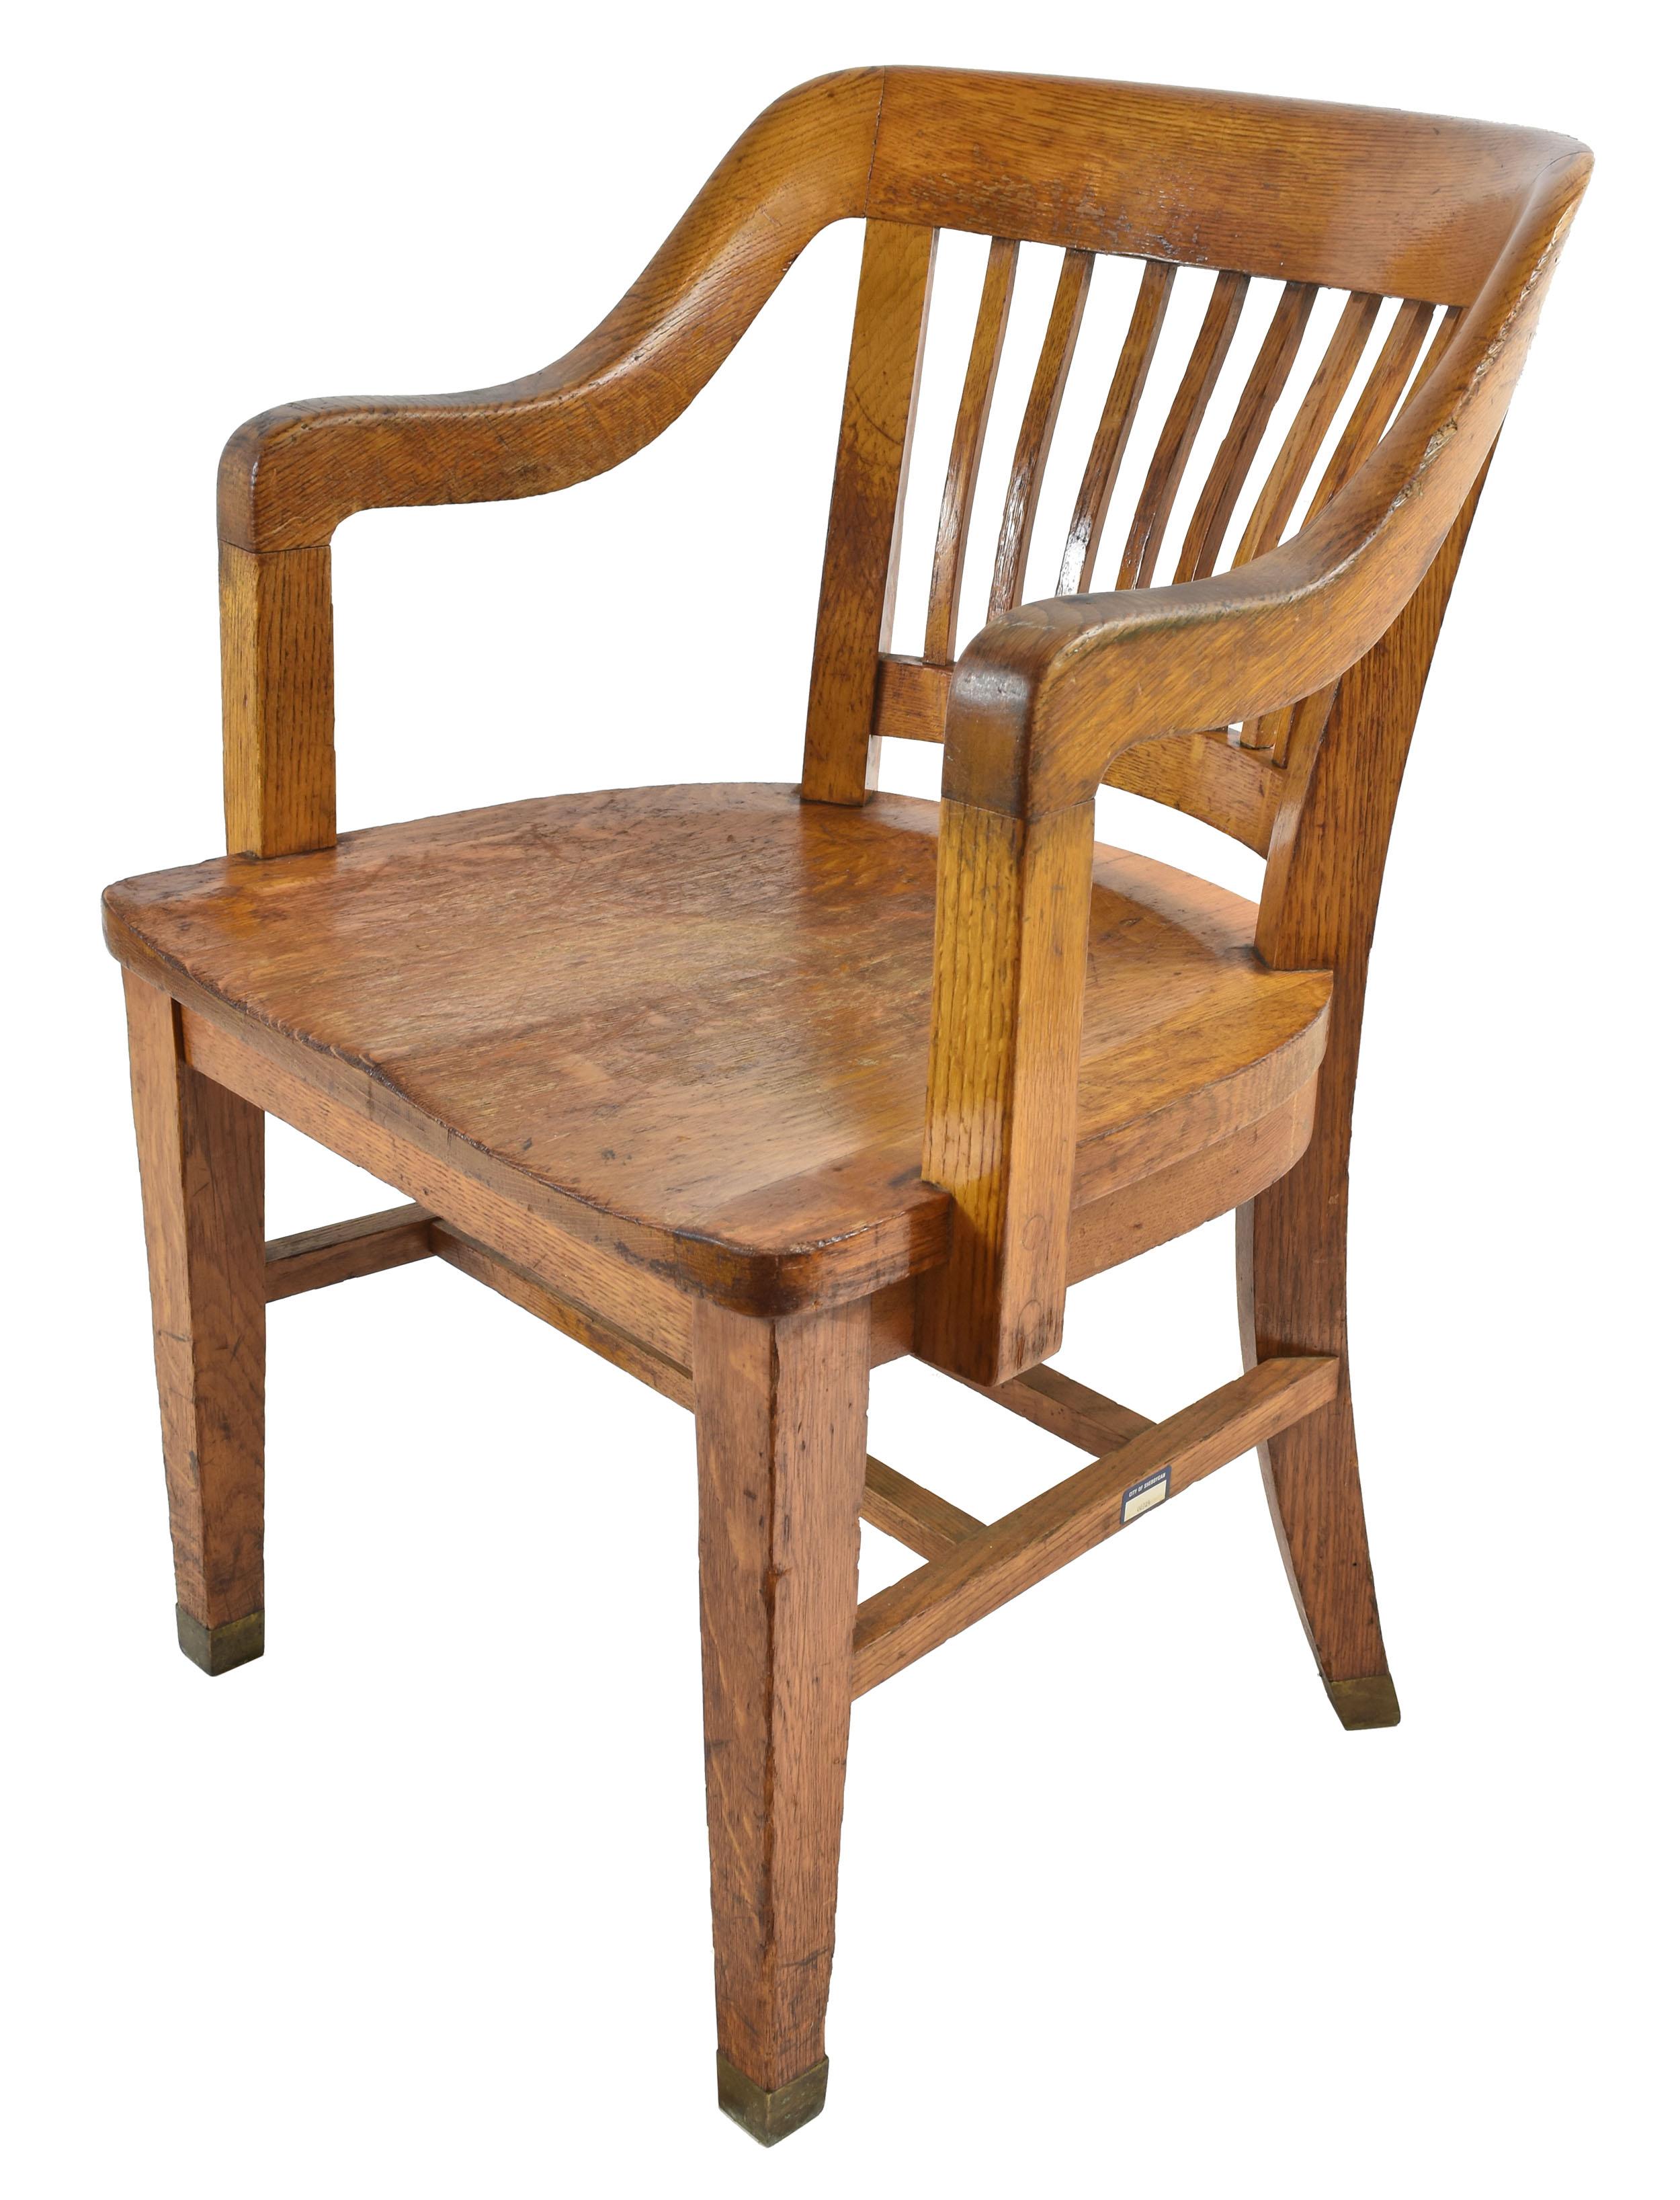 47978 courtroom oak chairs 2.jpg